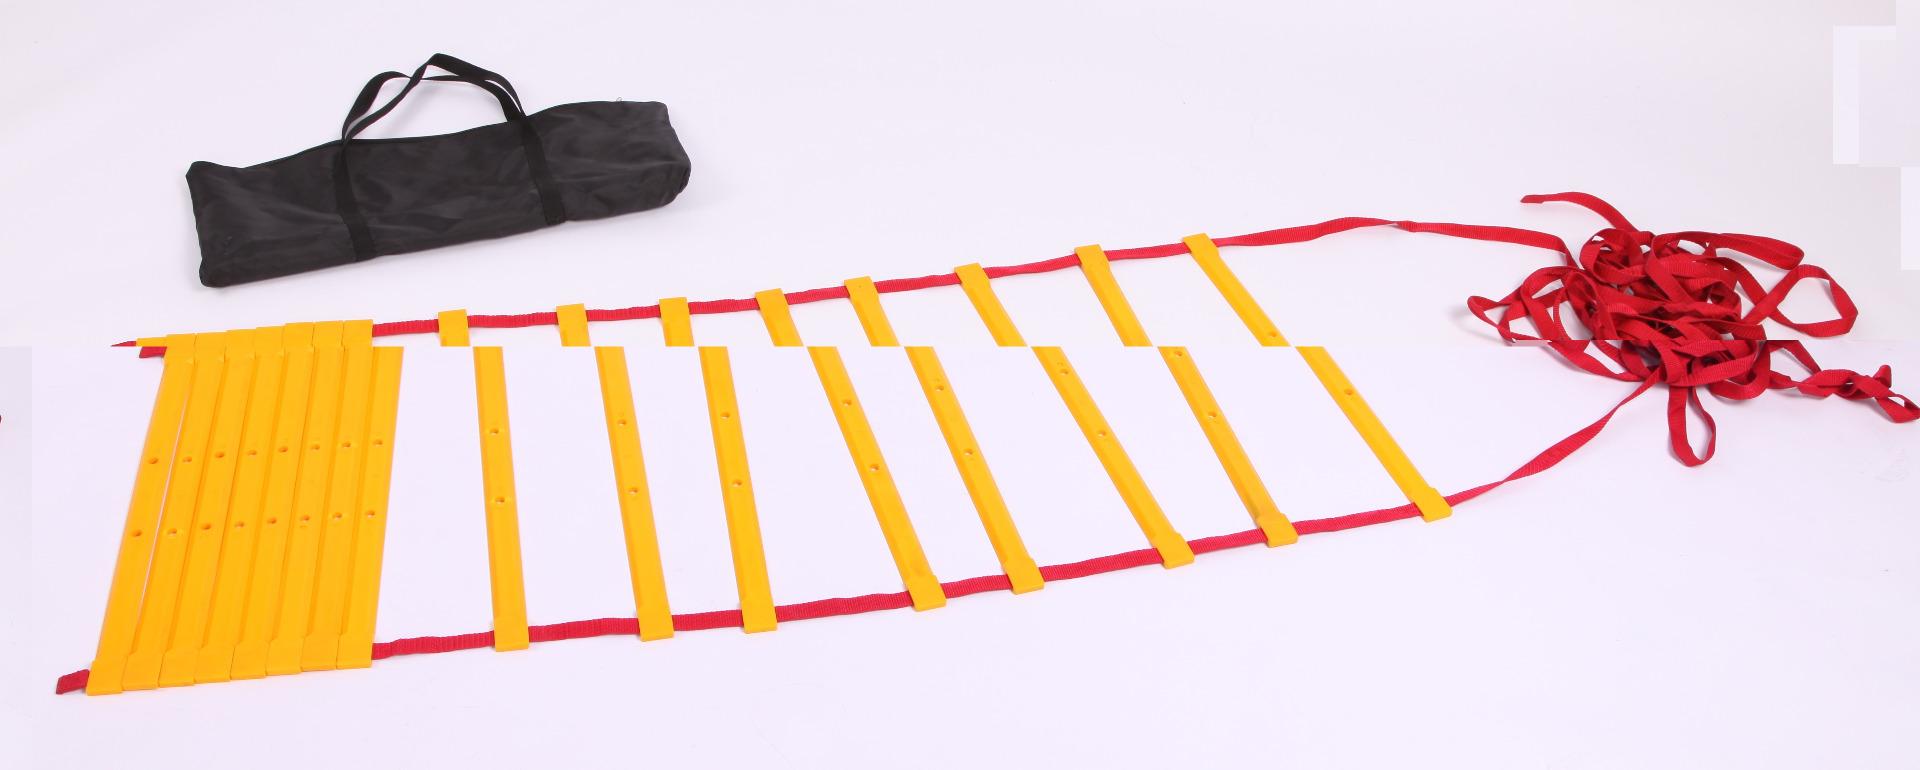 9m Agility Speed Training Ladder  Z2463